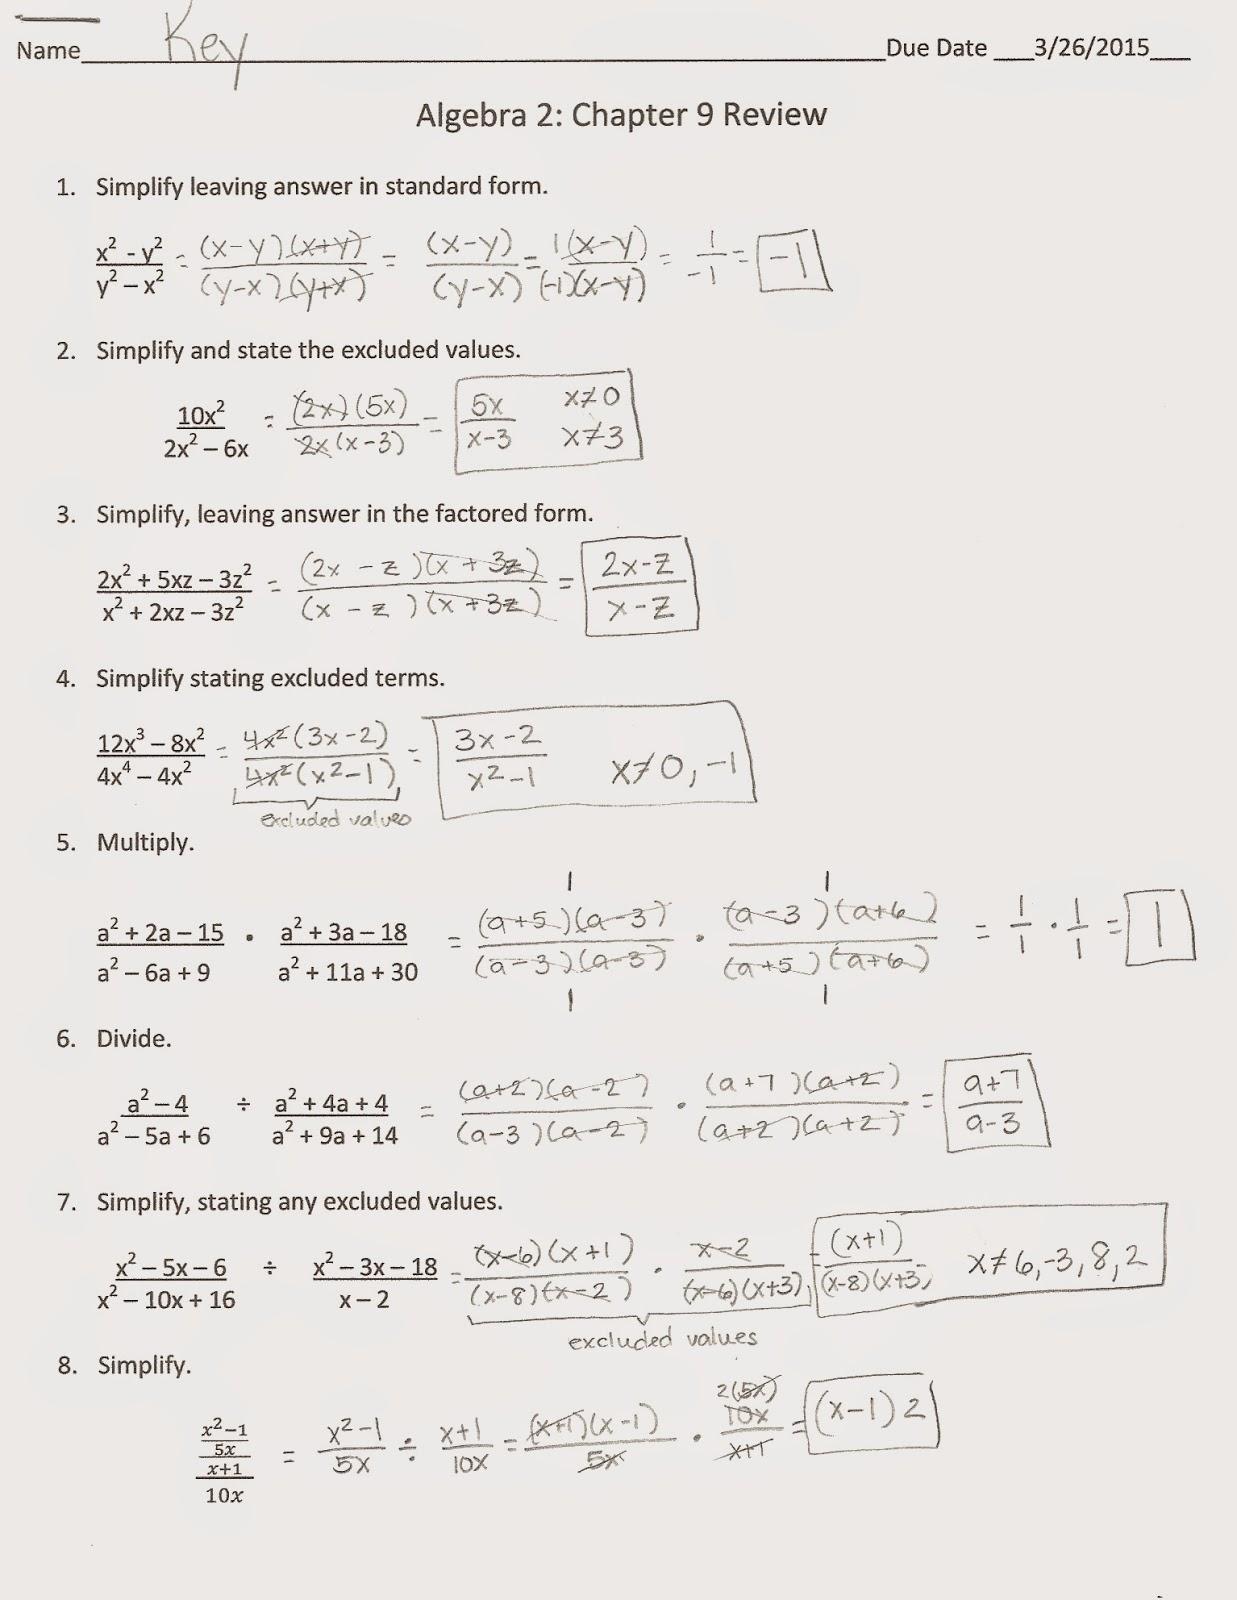 Algebra Alerts Algebra 1 And 2 Algebra 2 Chapter 9